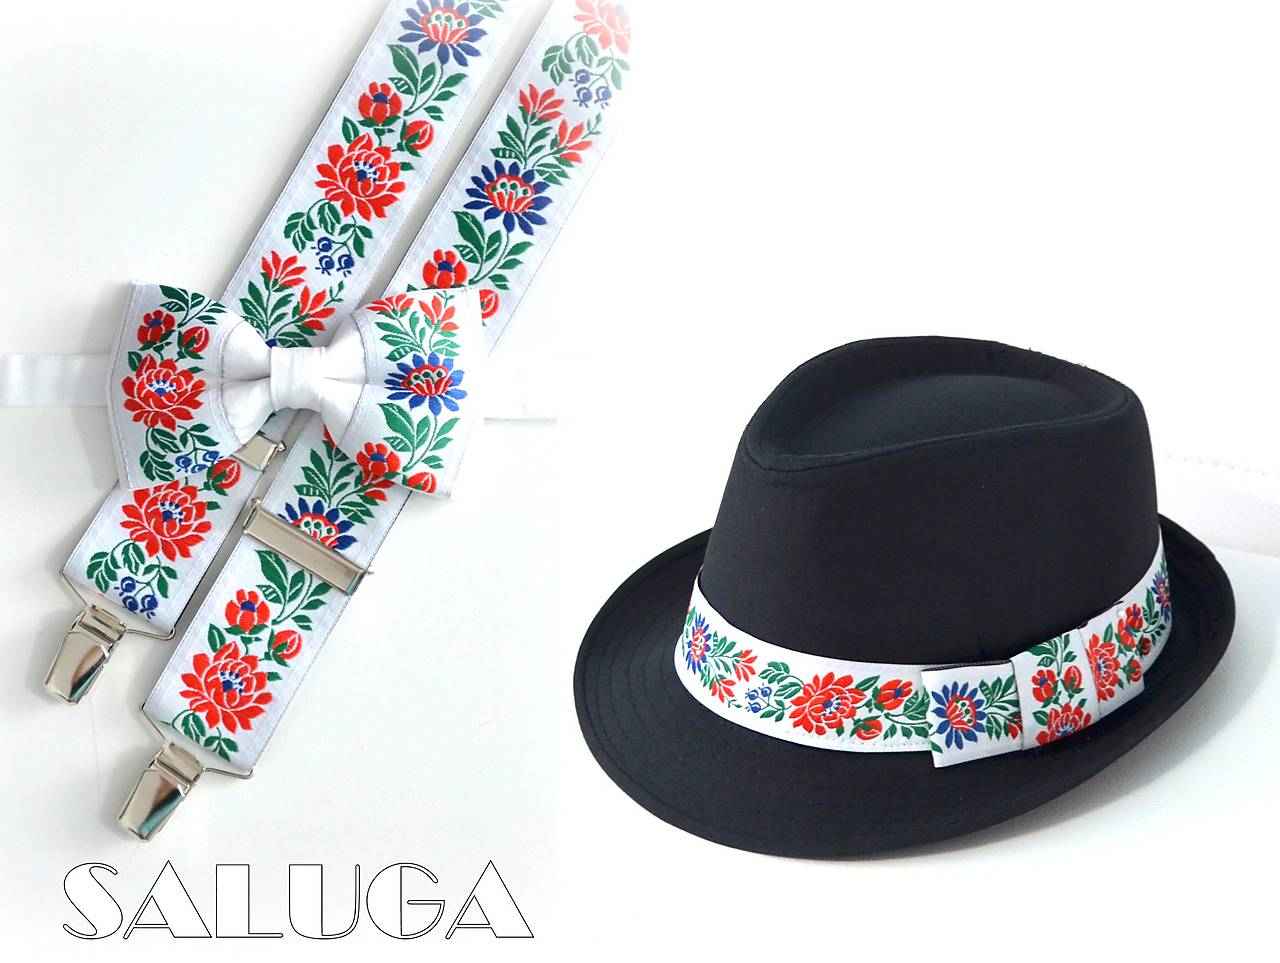 Set - folklórny pánsky klobúk - motýlik a traky  - Obrázok č. 1